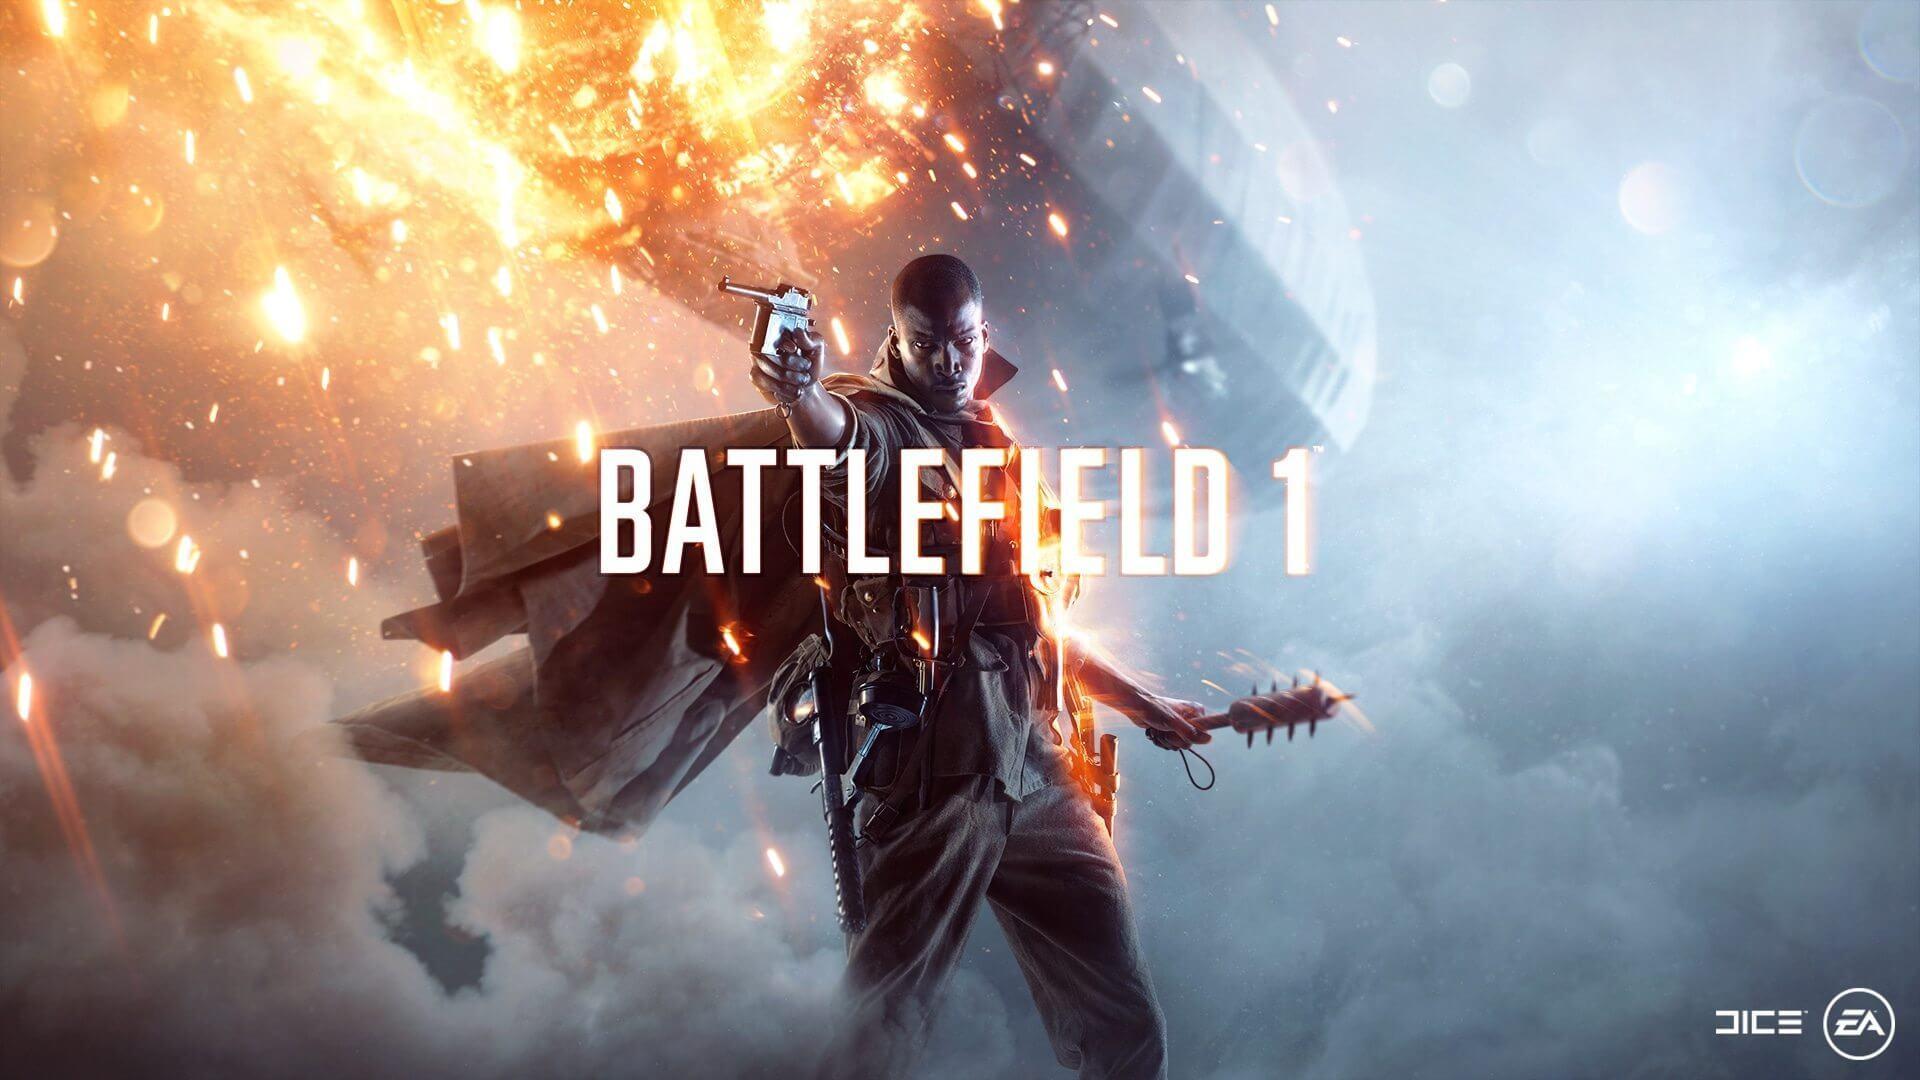 battlefield 1 capa 2 - Assista ao vivo a primeira gameplay de Battlefield 1 na E3 2016